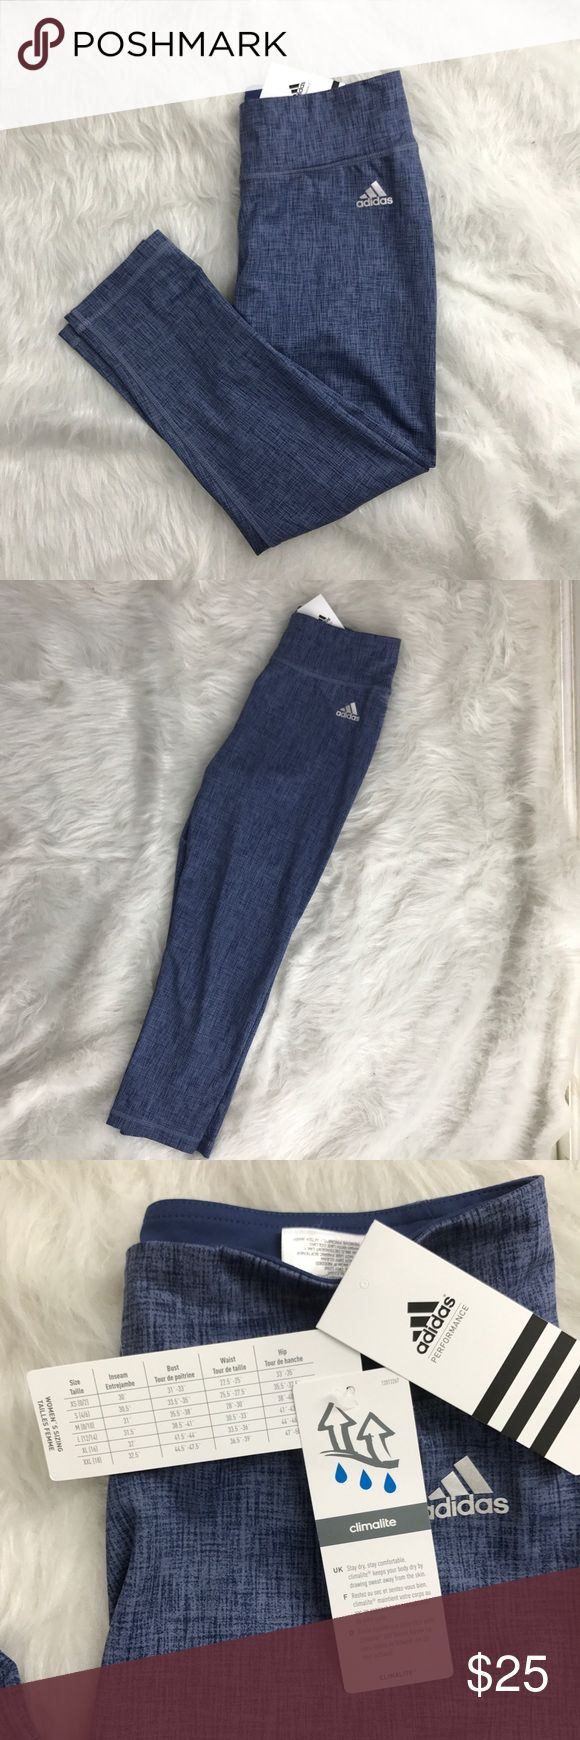 NWT Adidas climate control crop leggings NWT. Perfect for biking, running, yoga, lounging and more. No trades. Adidas Pants Leggings